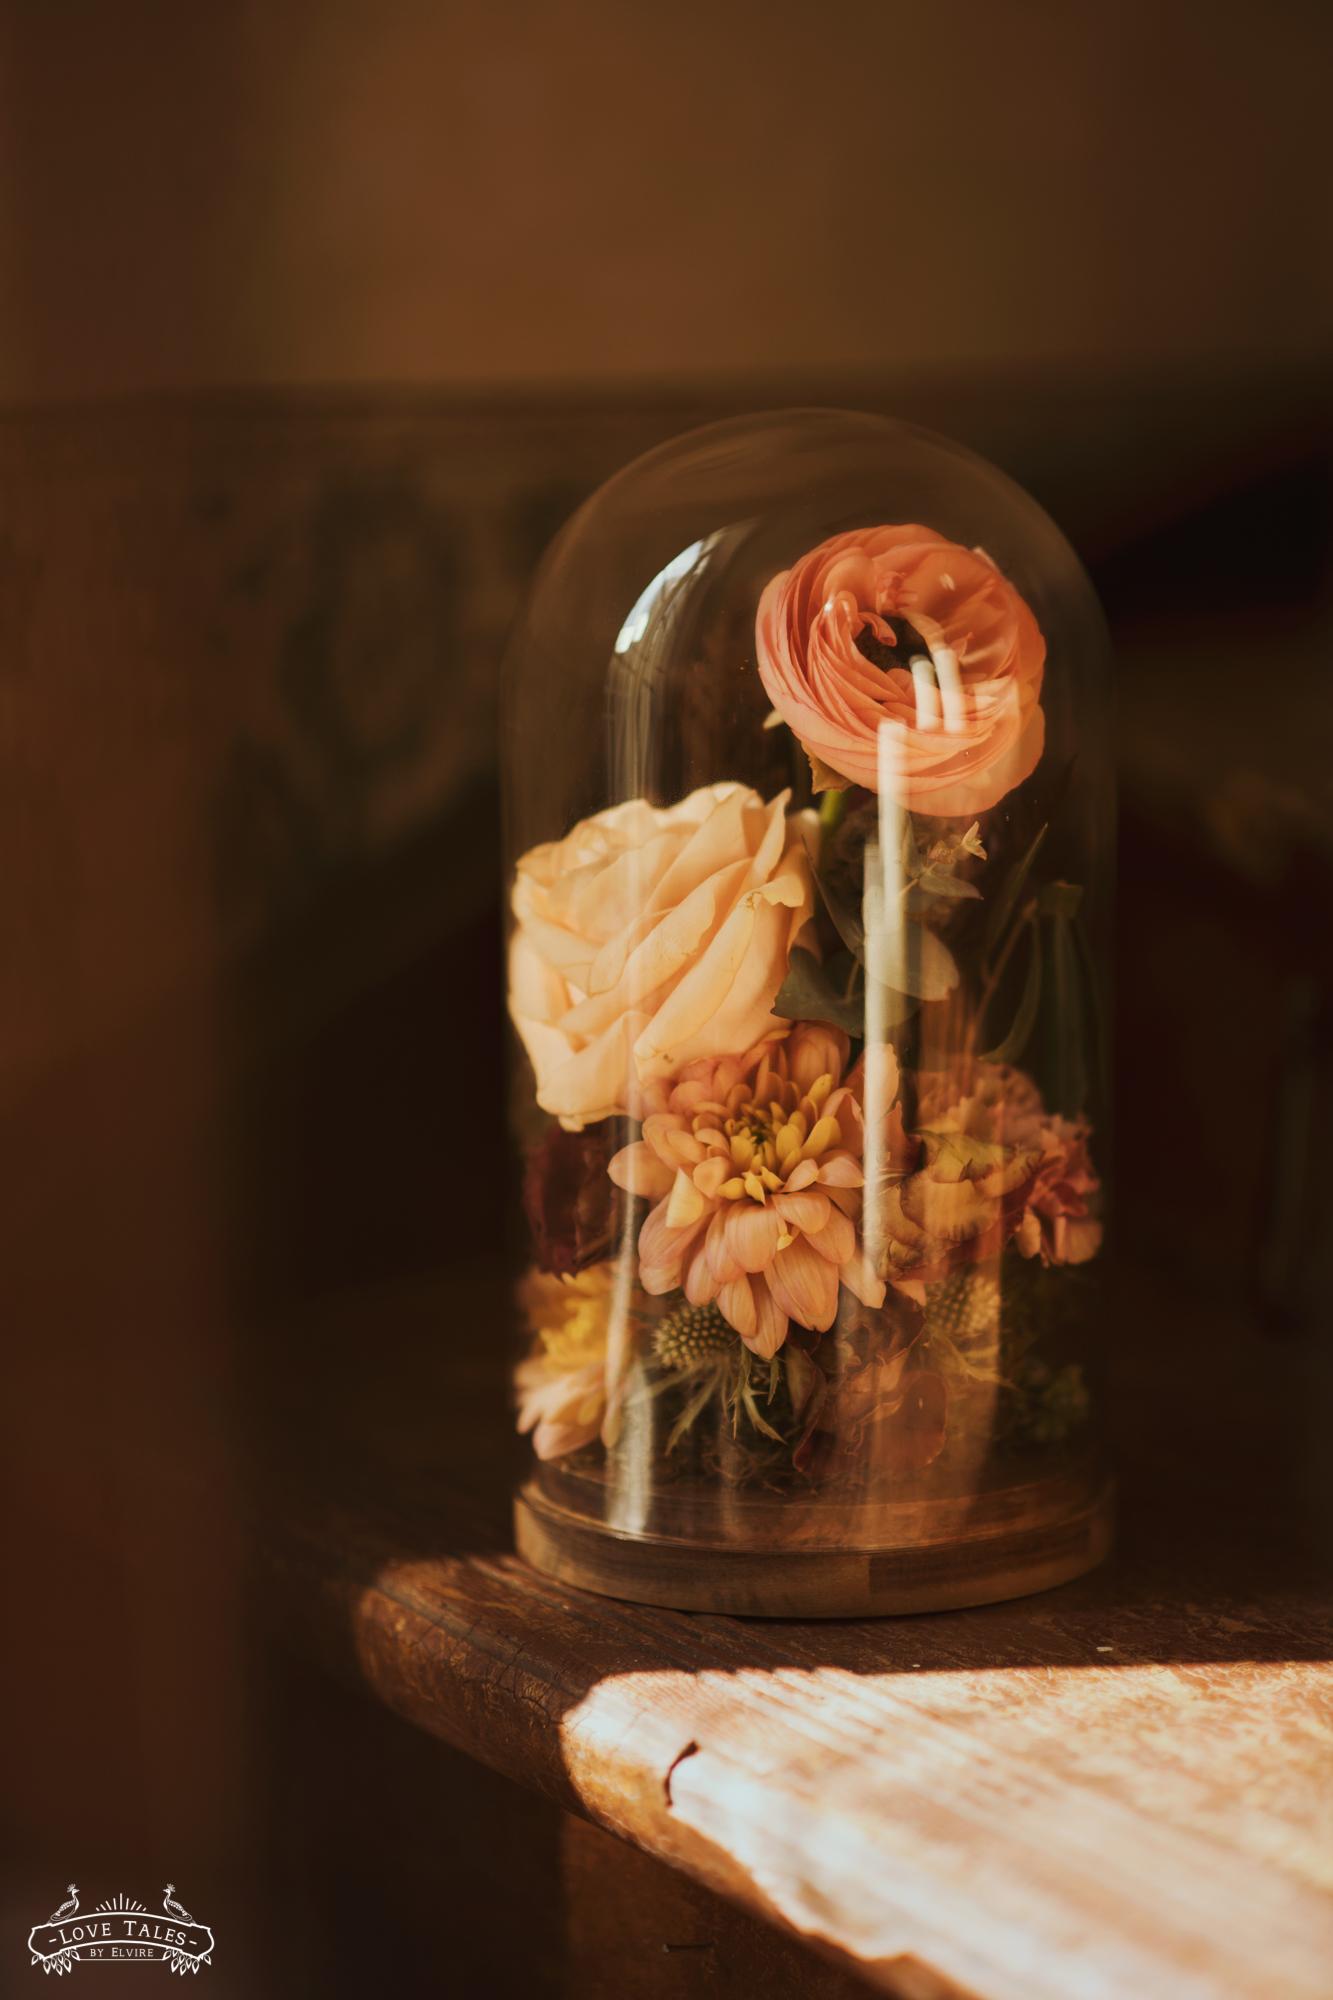 trouwfotograaf trouwreportage fairytale sprookje disney enchanted rose trouwboeket